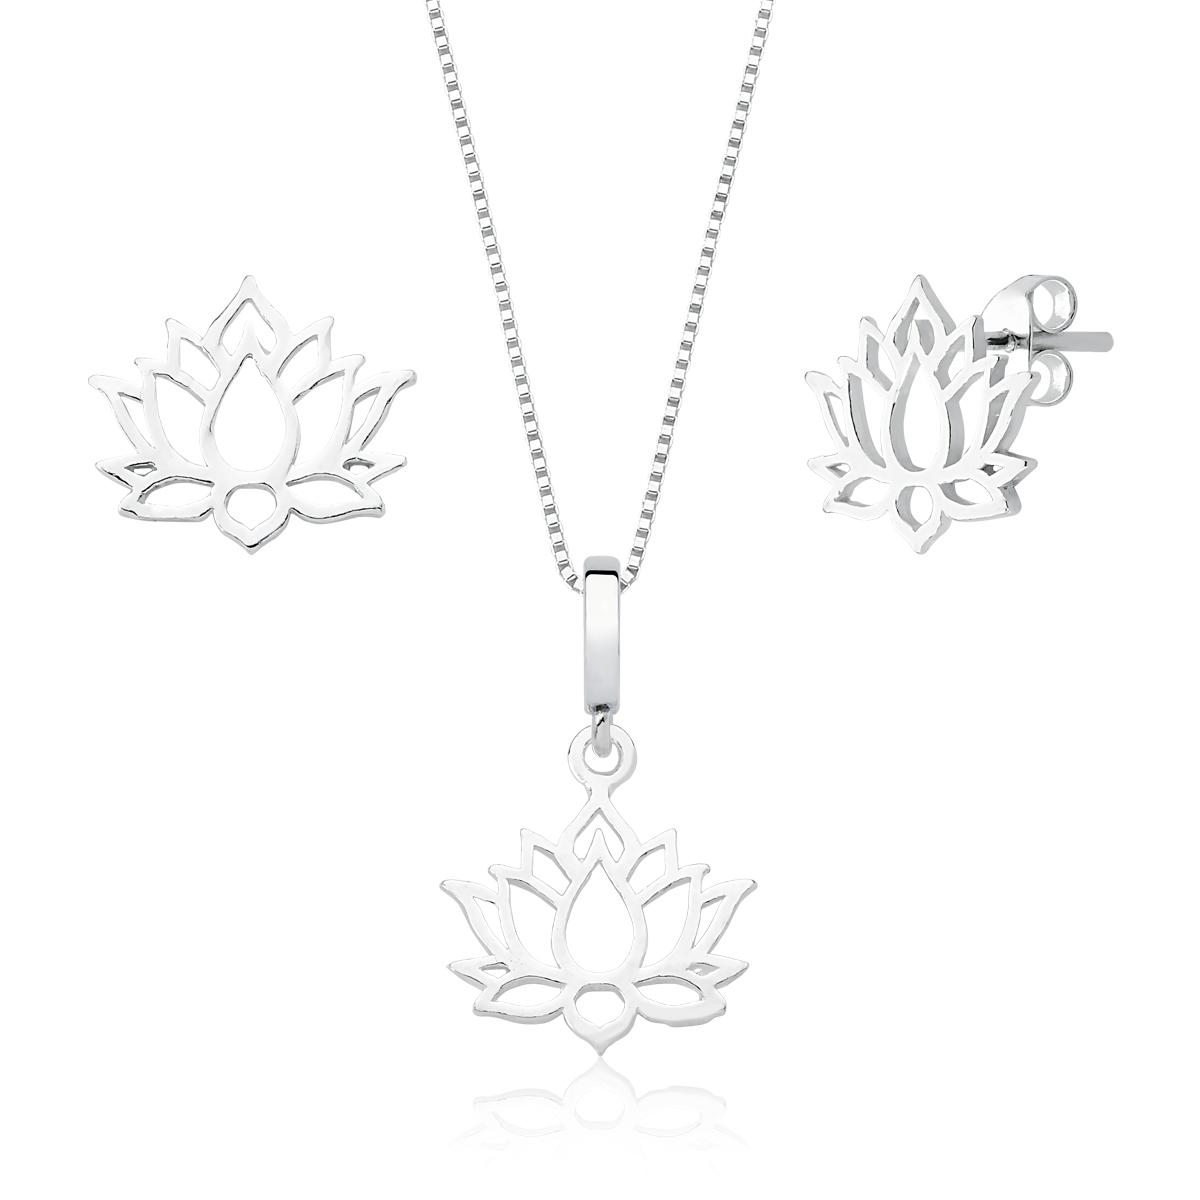 Conjunto Flor de Lótus - Florescer